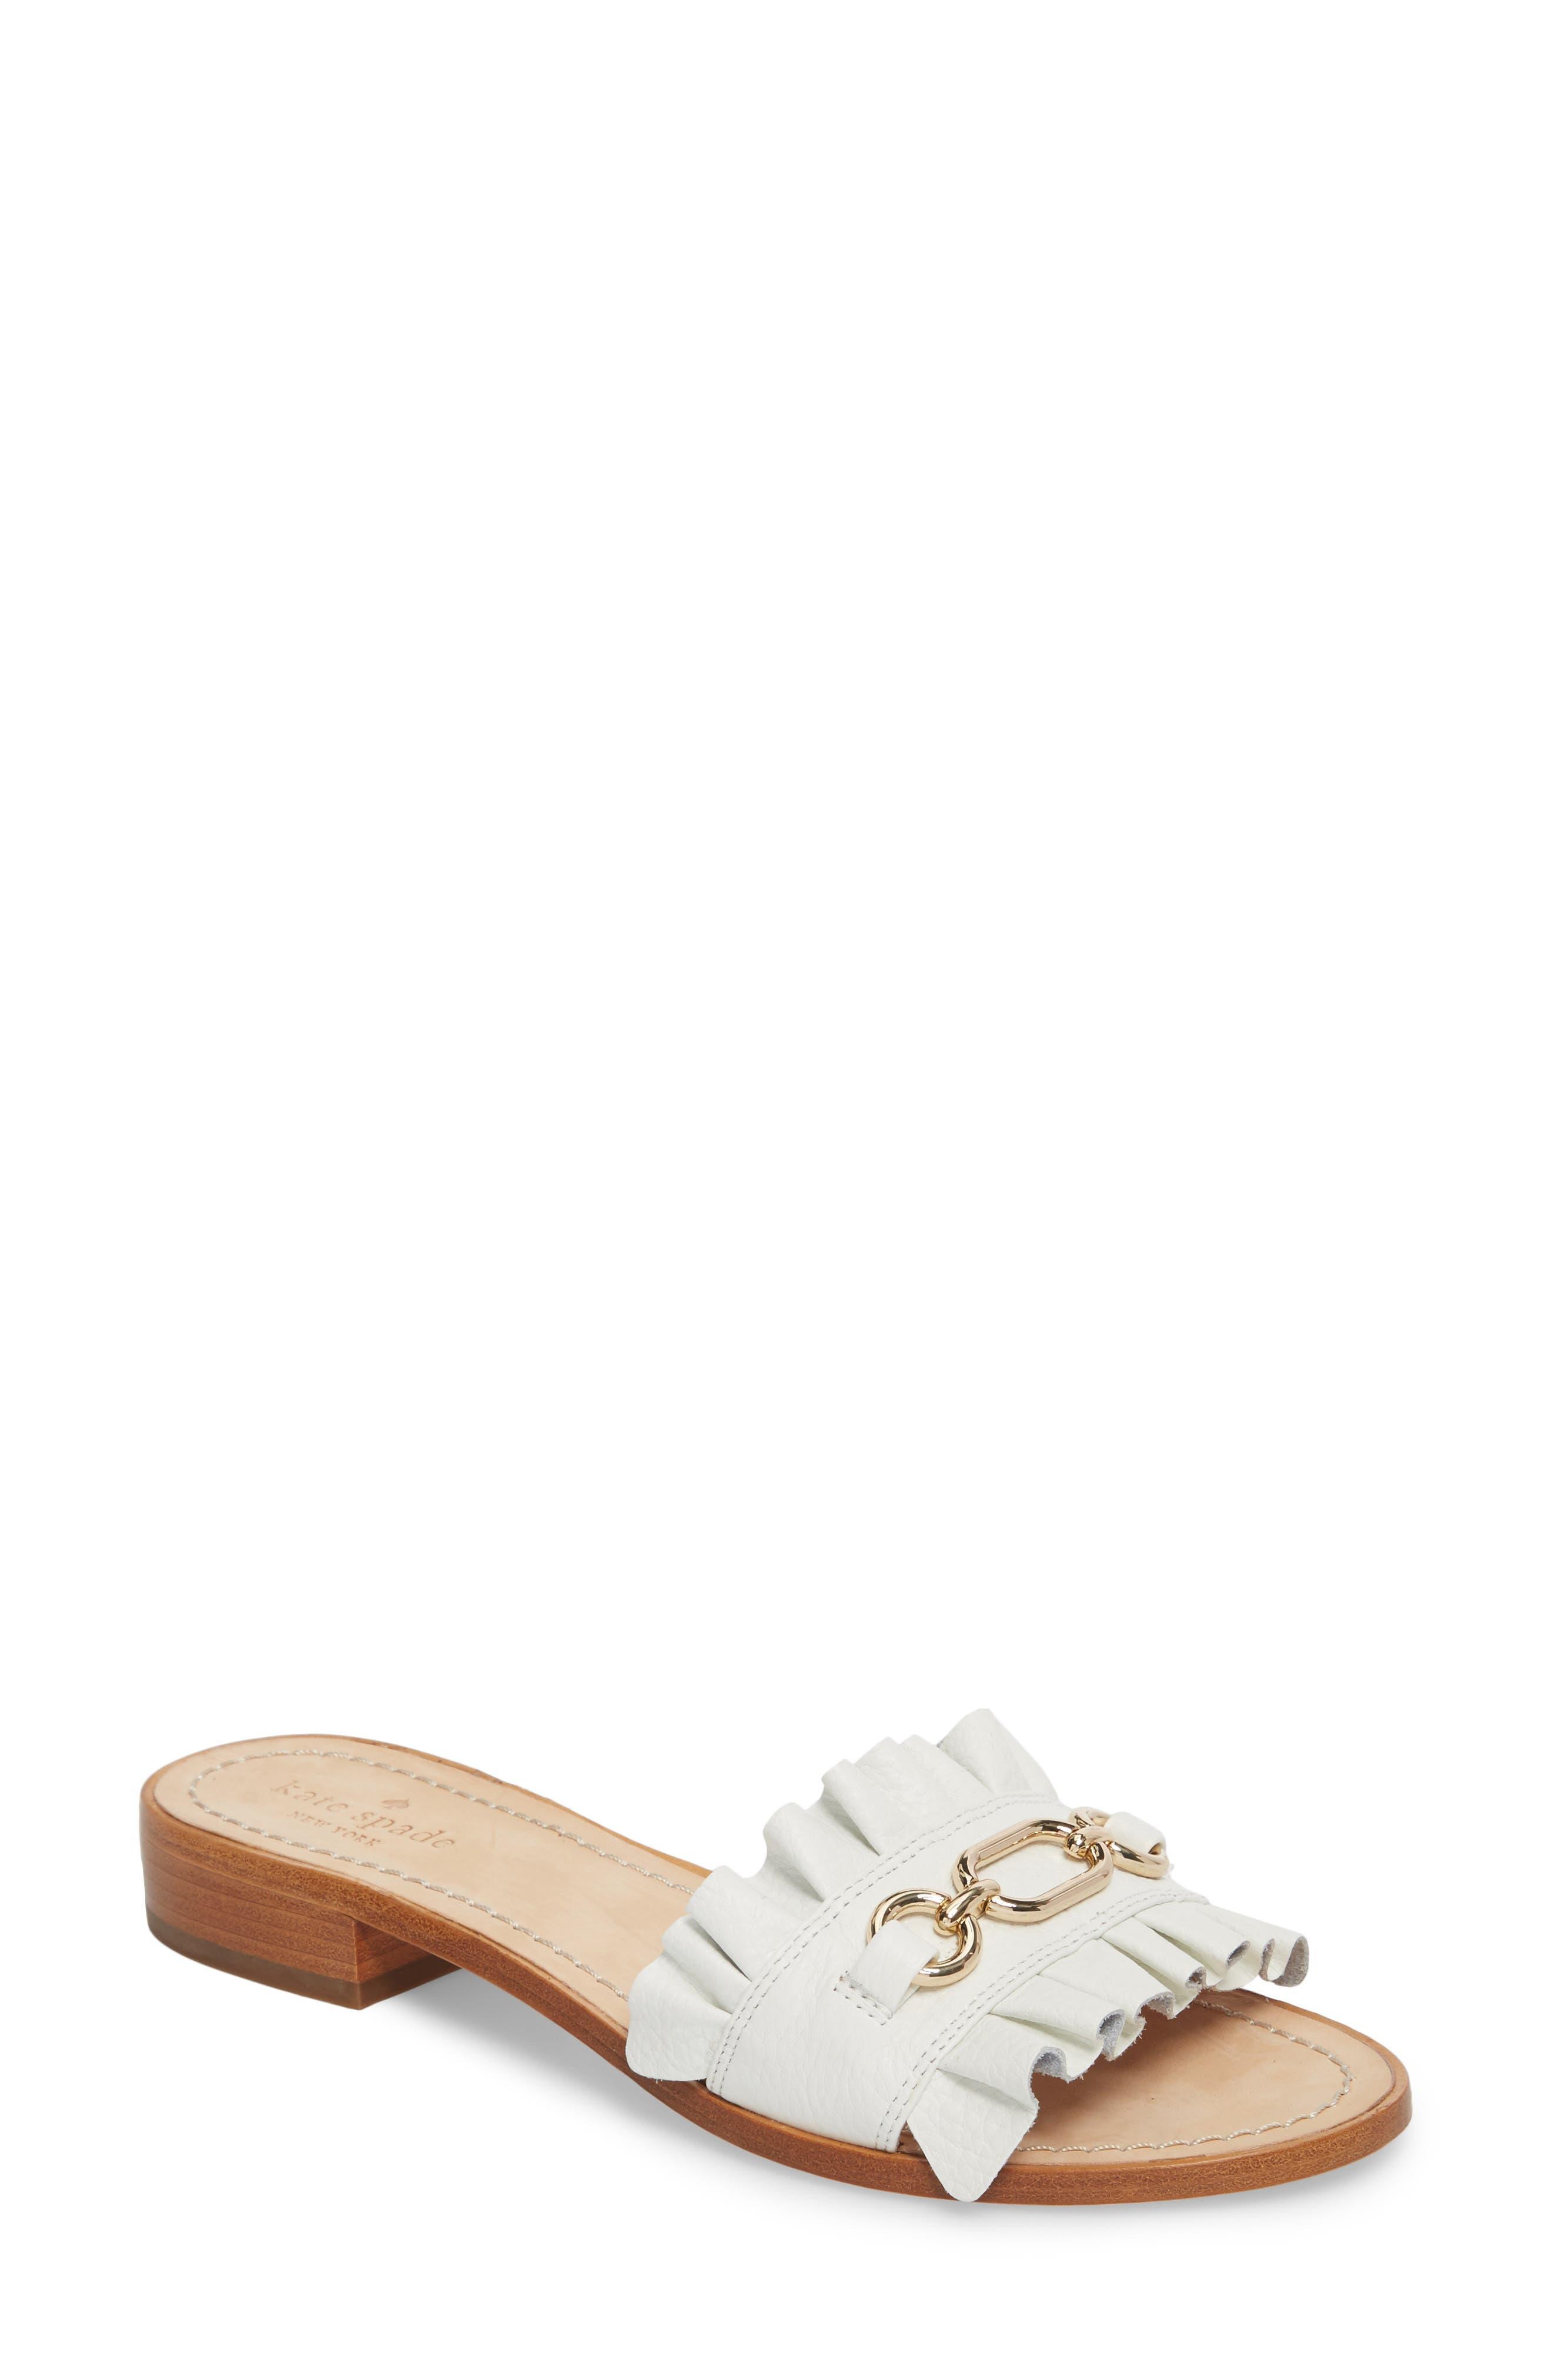 kate spade new york beau slide sandal (Women)